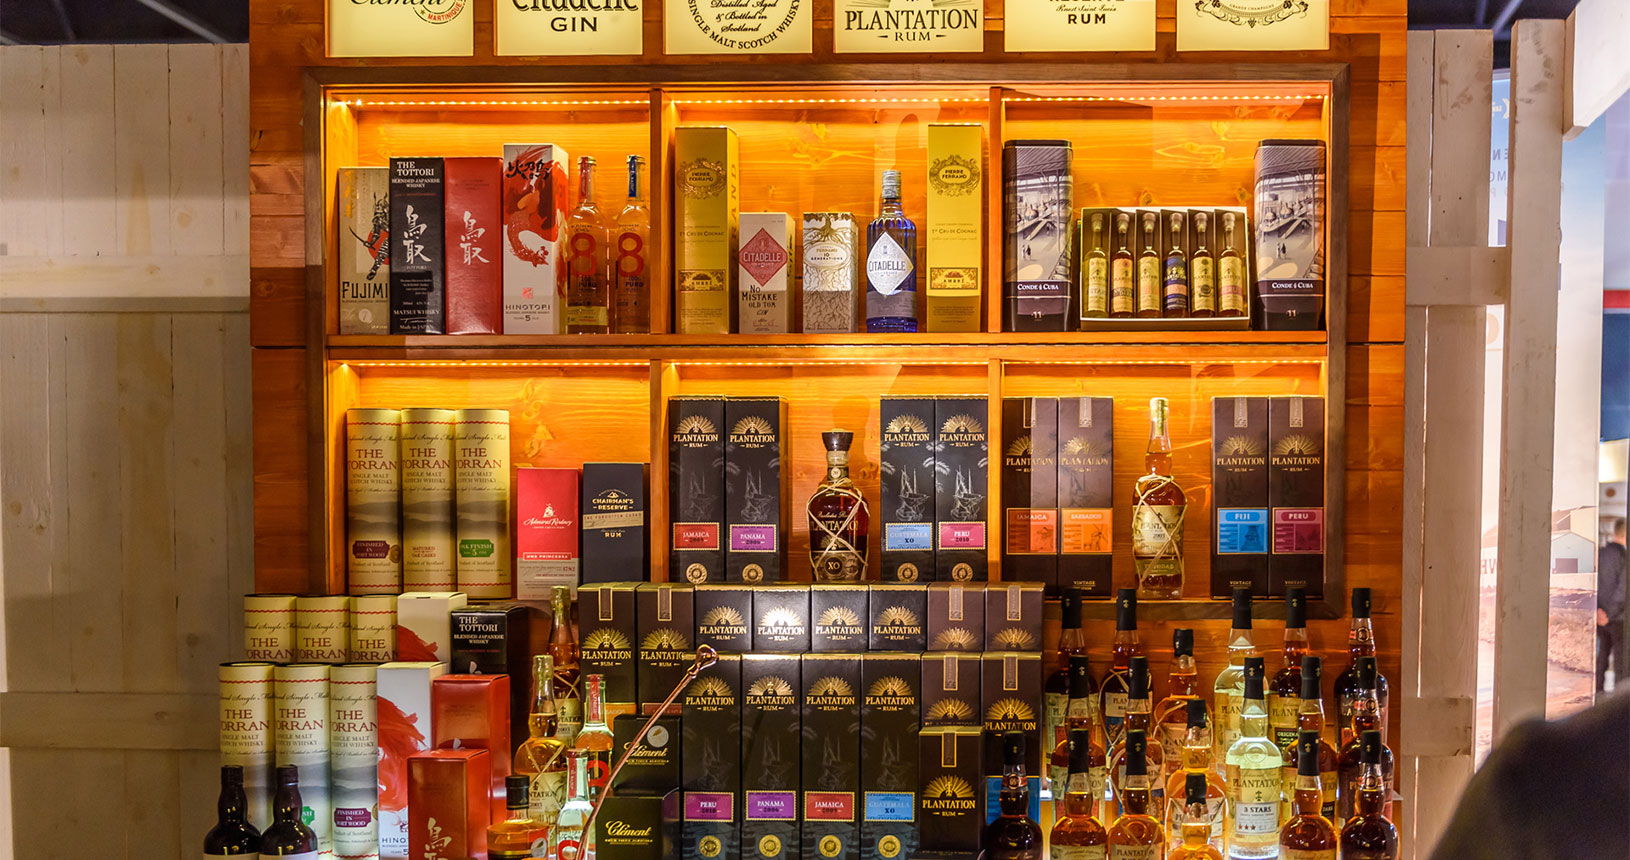 Rum Gin Whisky Bottle Market Bremen